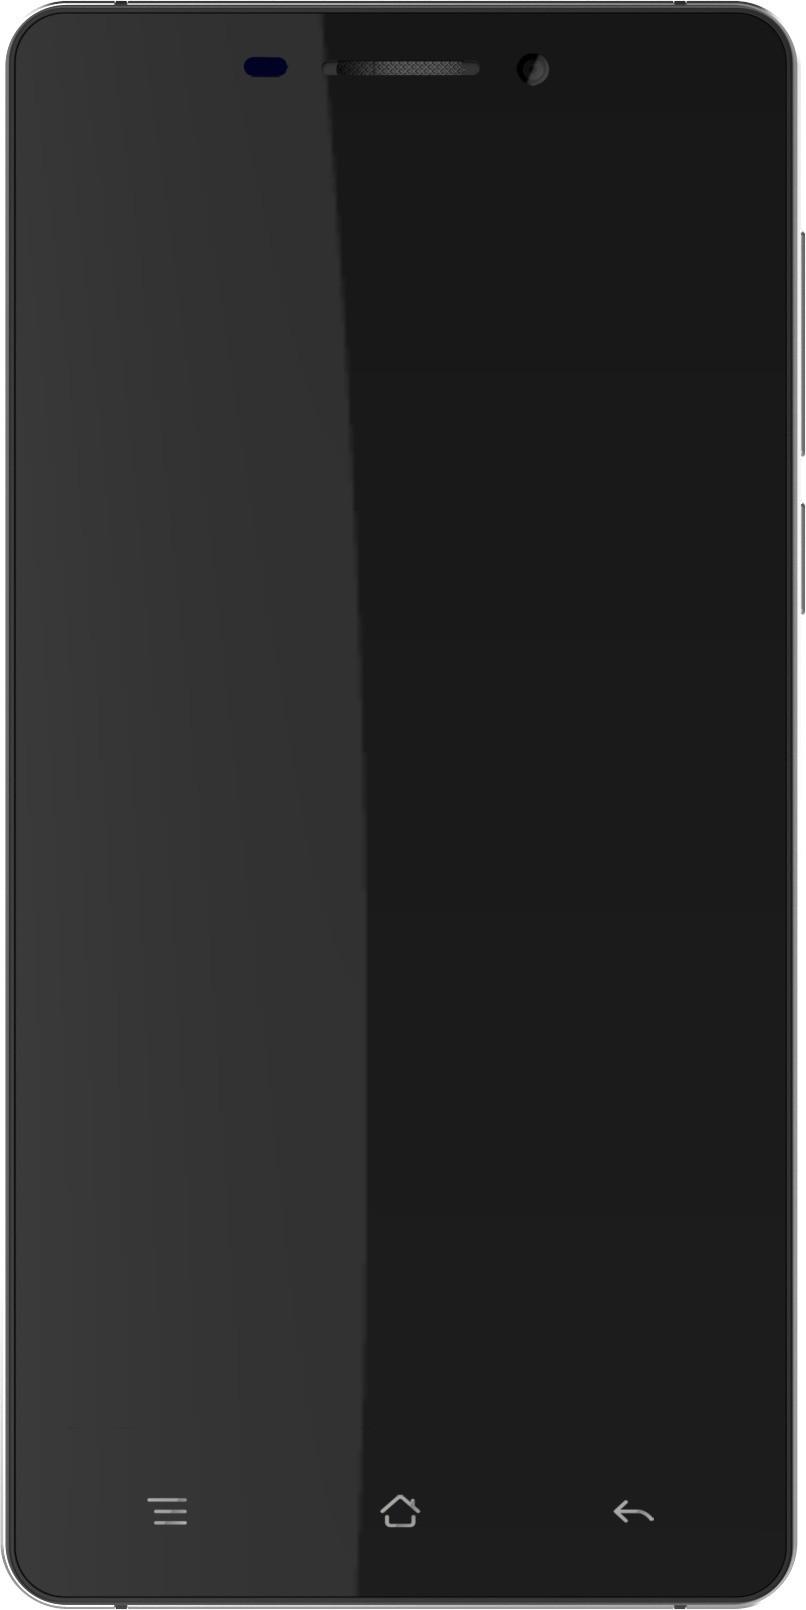 Chilli H1 (1GB RAM, 4GB)